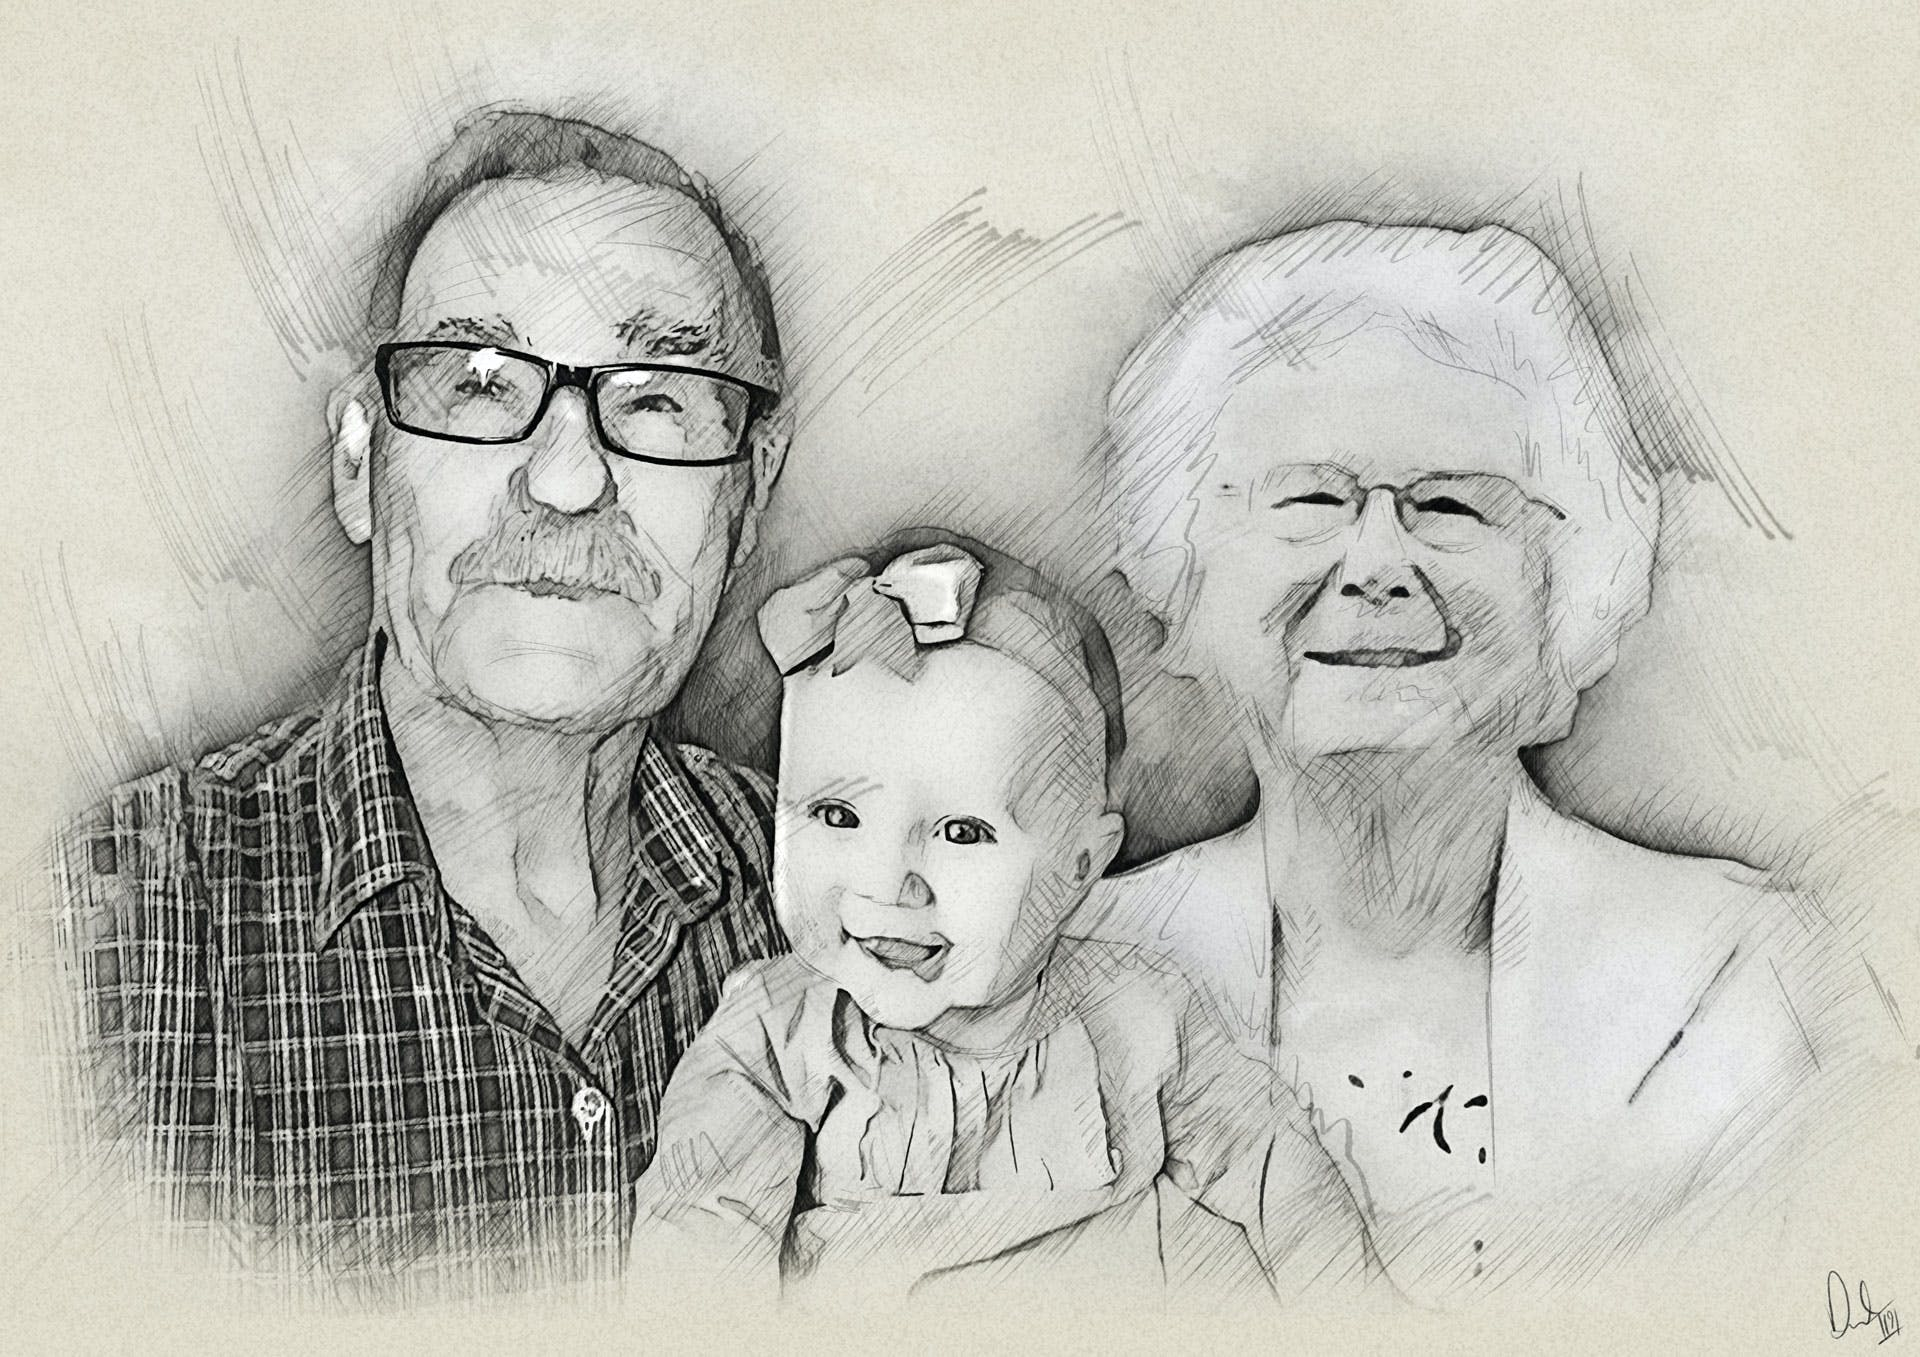 Realistic detailed custom portrait drawing